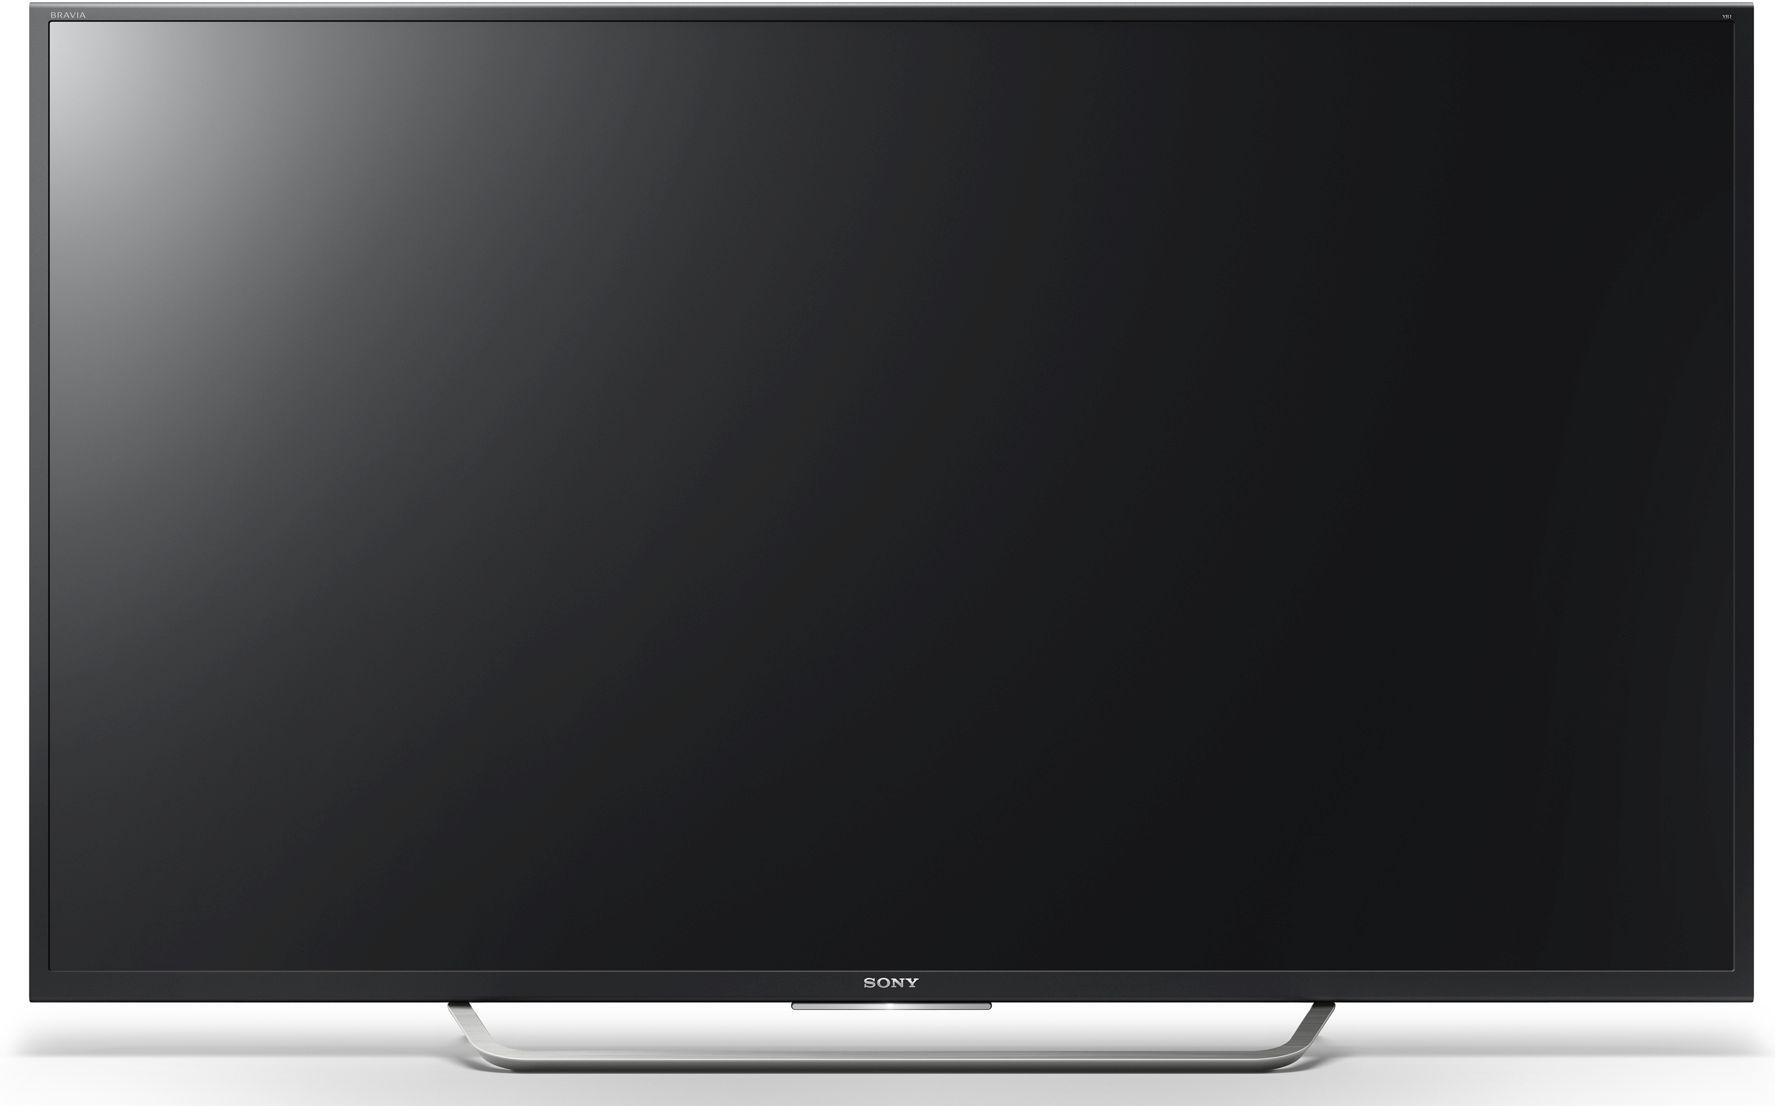 Sony® X750D Series 65